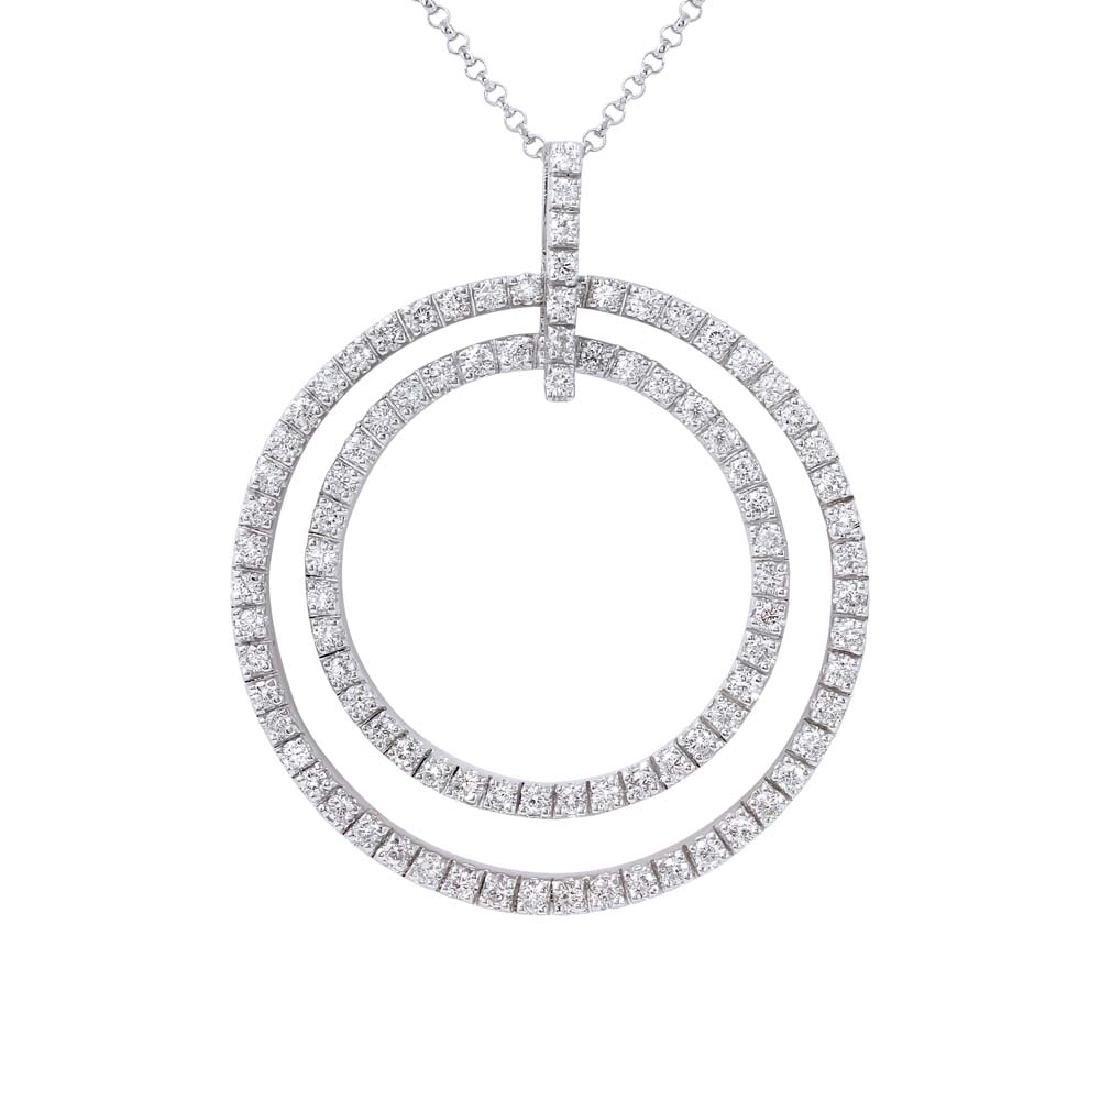 Genuine 1.16 TCW 18K White Gold Ladies Necklace